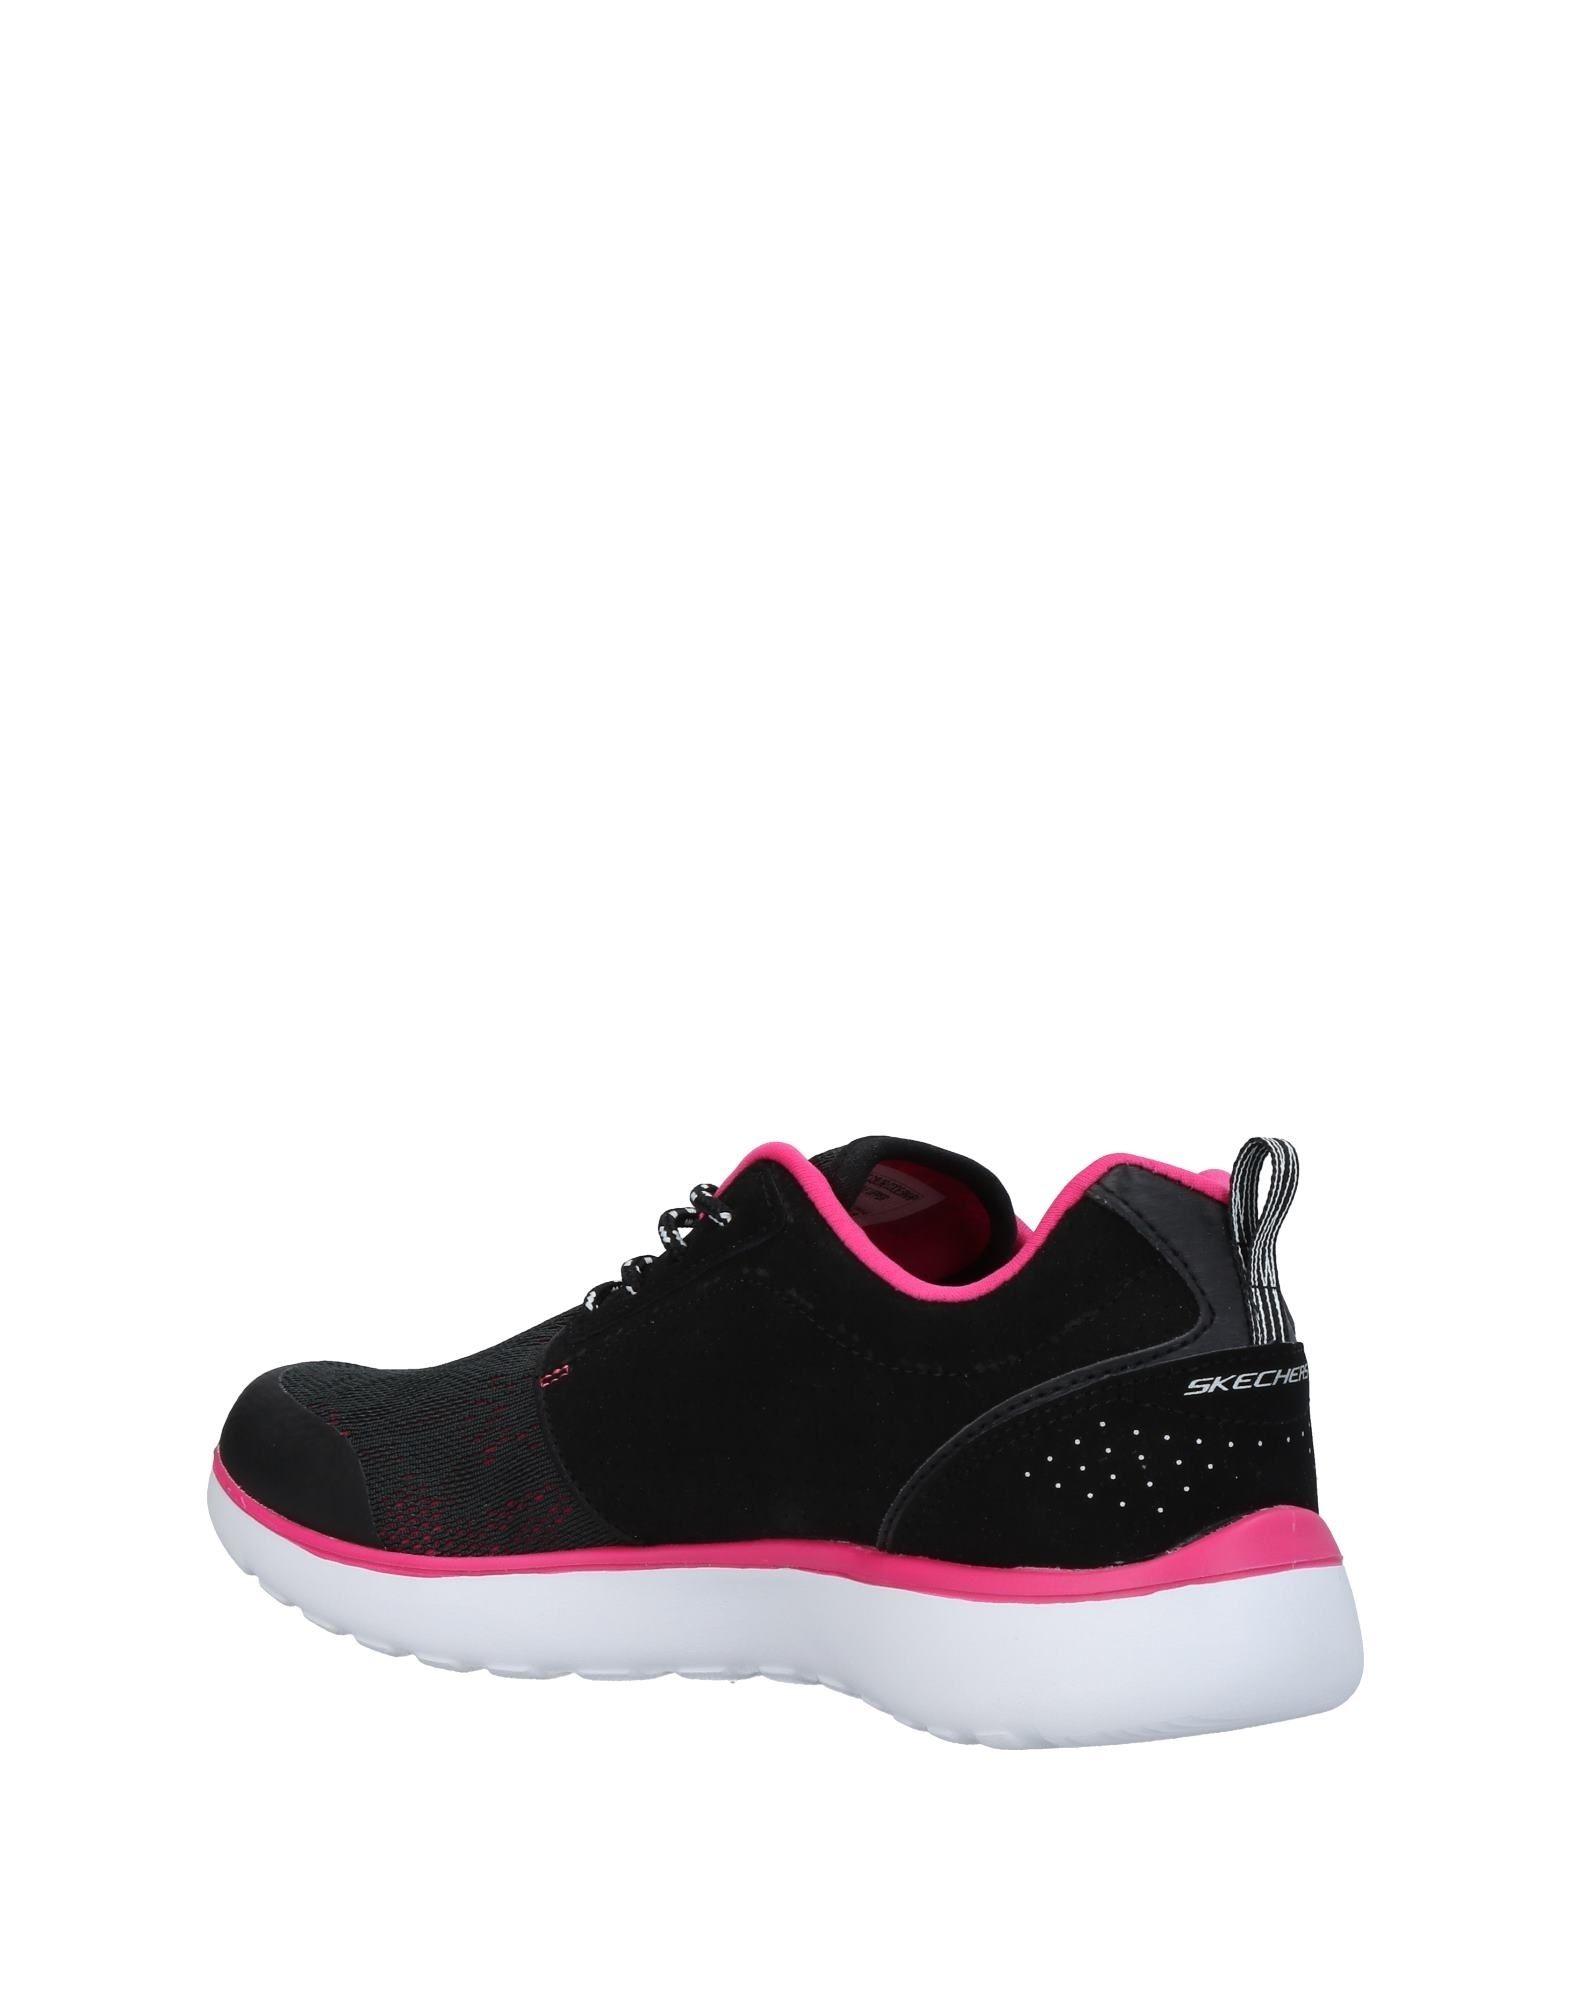 Skechers Sneakers Damen   11436807LF c54092